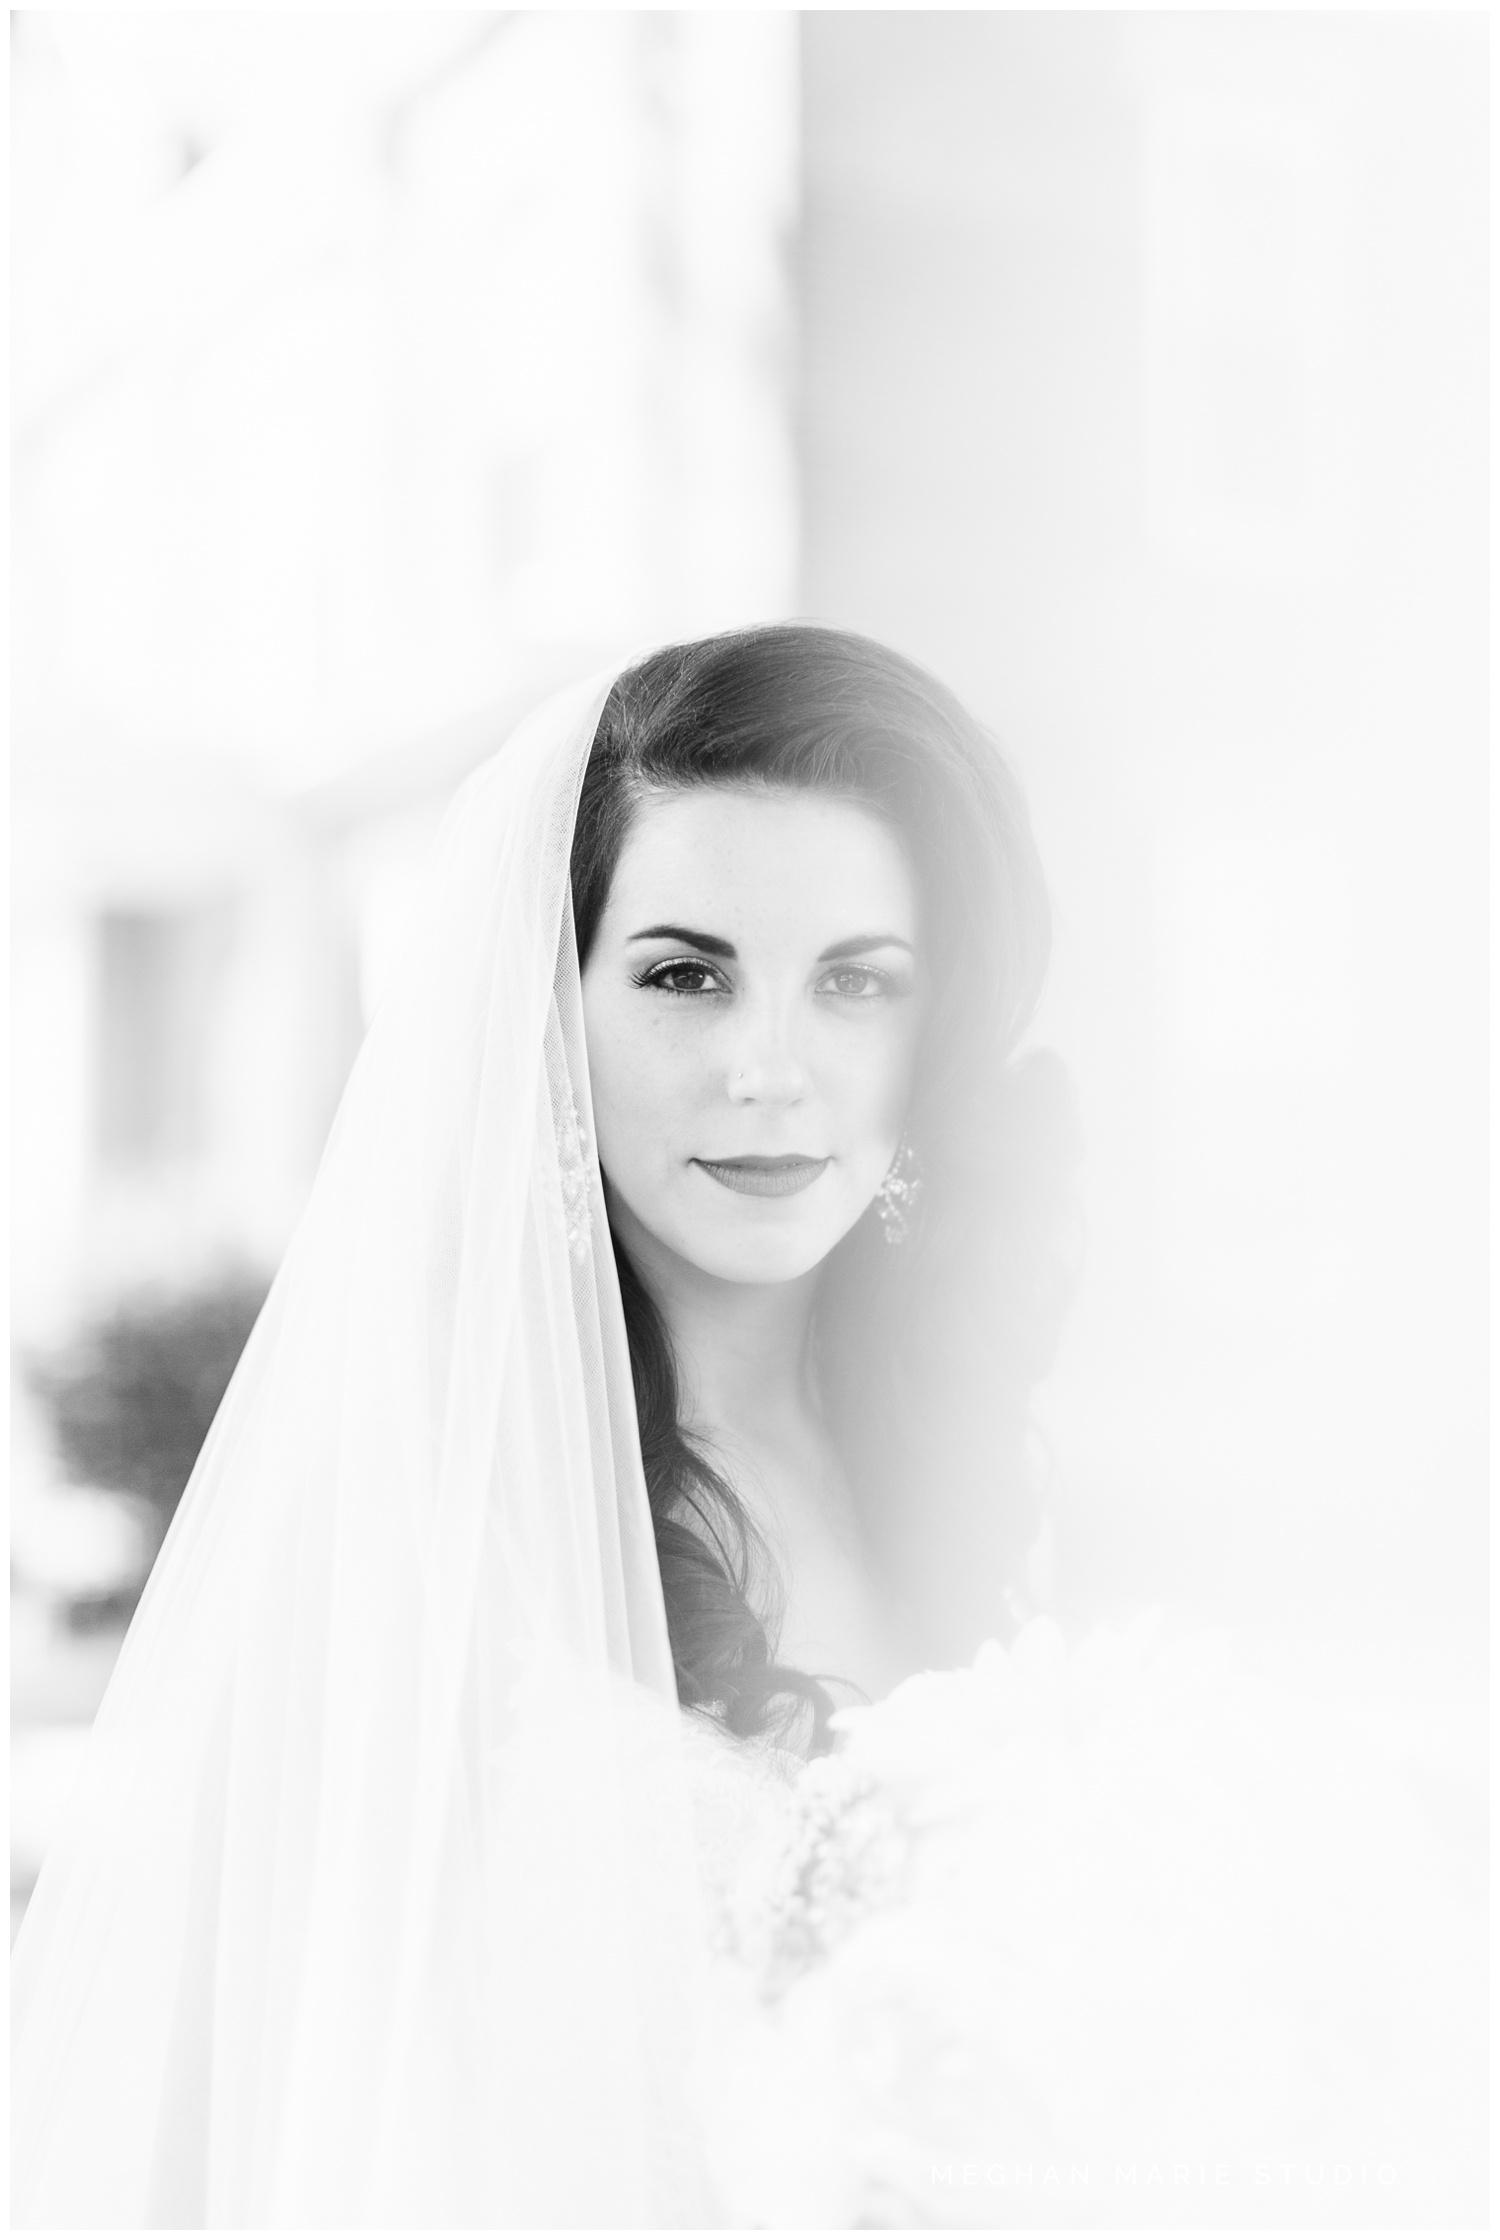 meghan marie studio wedding photographer ohio troy dayton columbus fort loramie st michael hall demange ken midmark elegant black suits metallics hollywood soft glam family wedding_0531.jpg